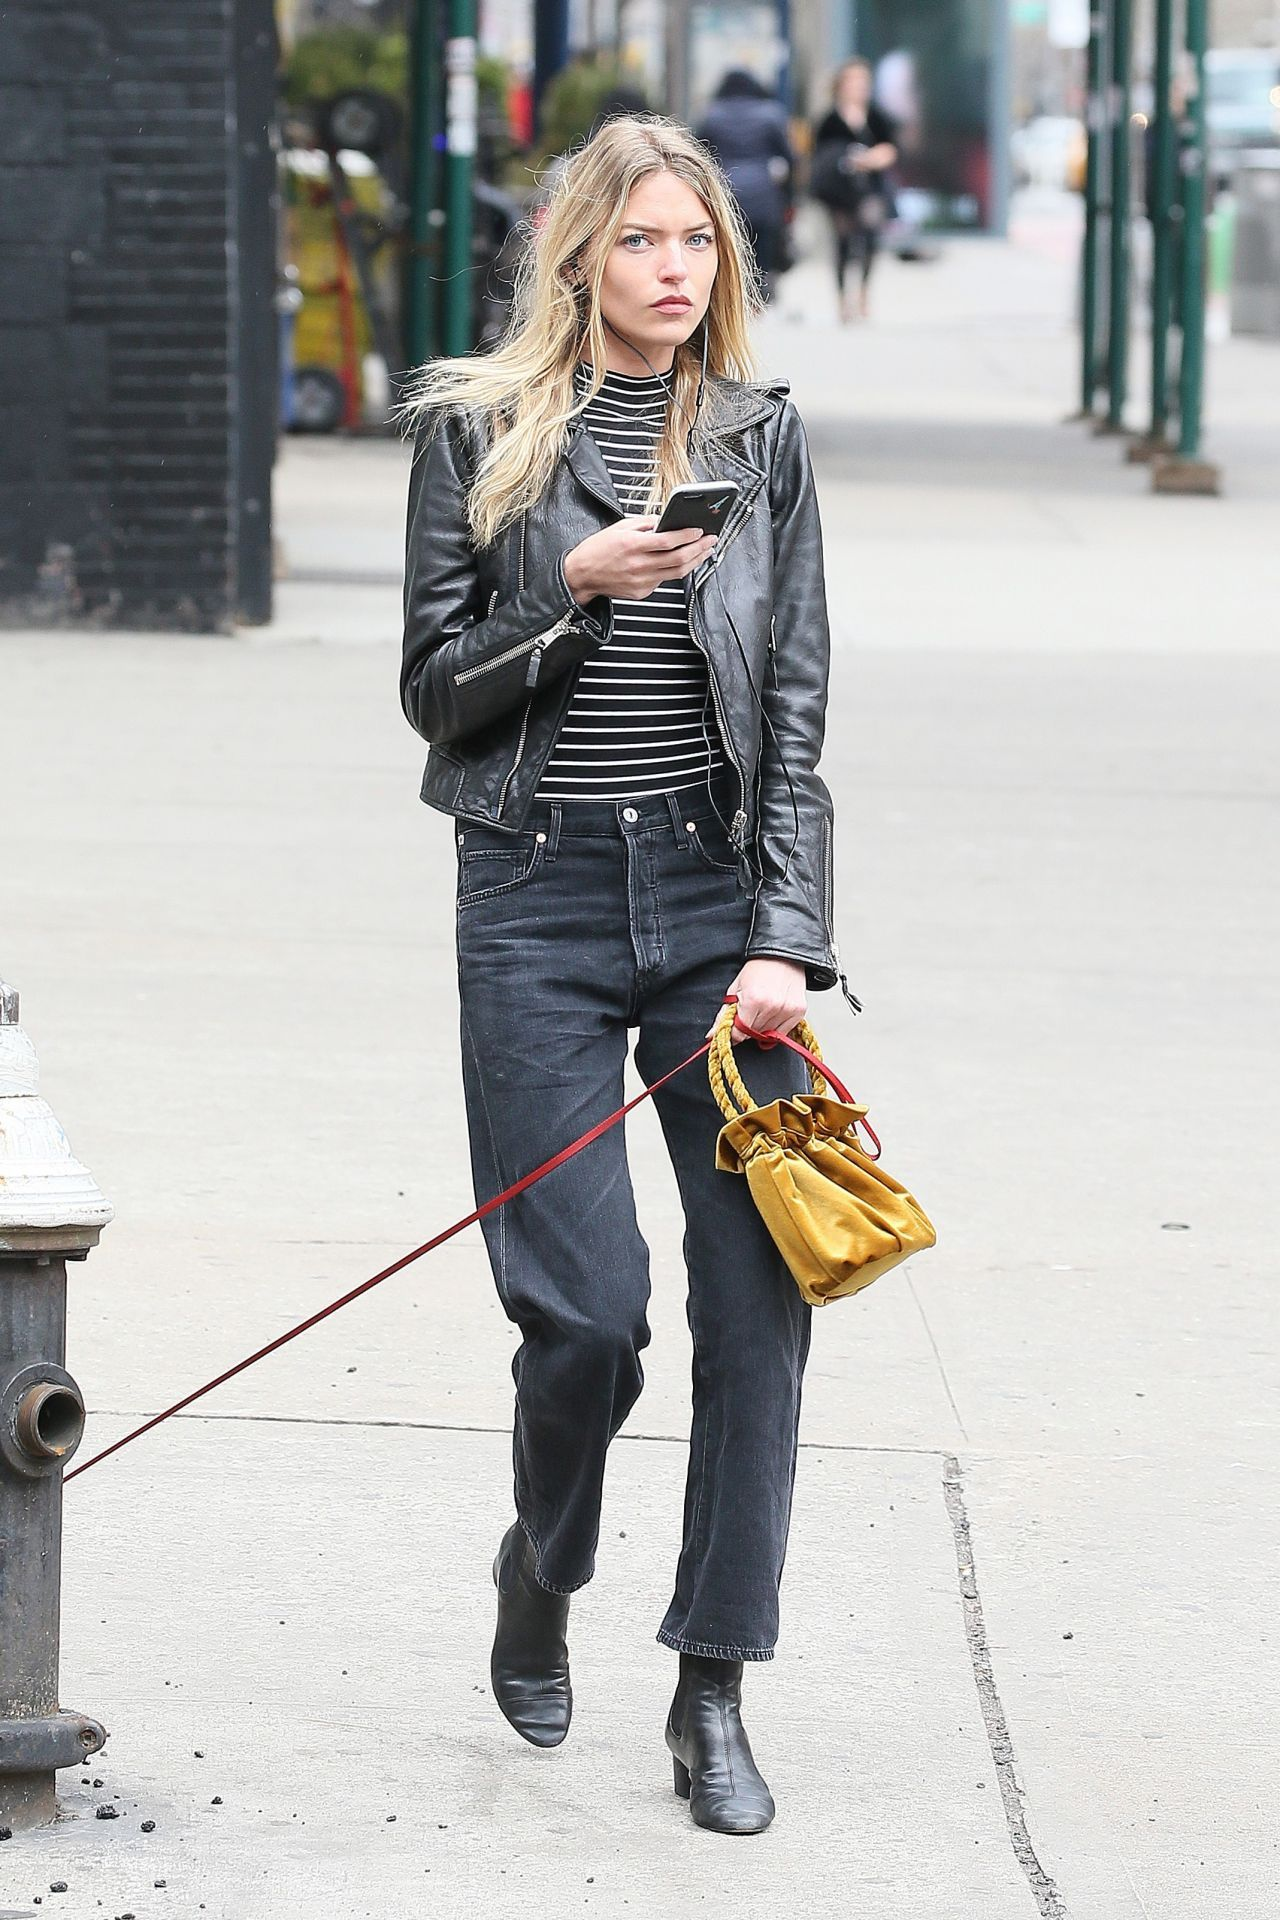 #MarthaHunt, #NewYork Martha Hunt Urban Outfit - Walks Her Dog in New York – 04/07/2017 | Celebrity Uncensored! Read more: http://celxxx.com/2017/04/martha-hunt-urban-outfit-walks-her-dog-in-new-york-04072017/